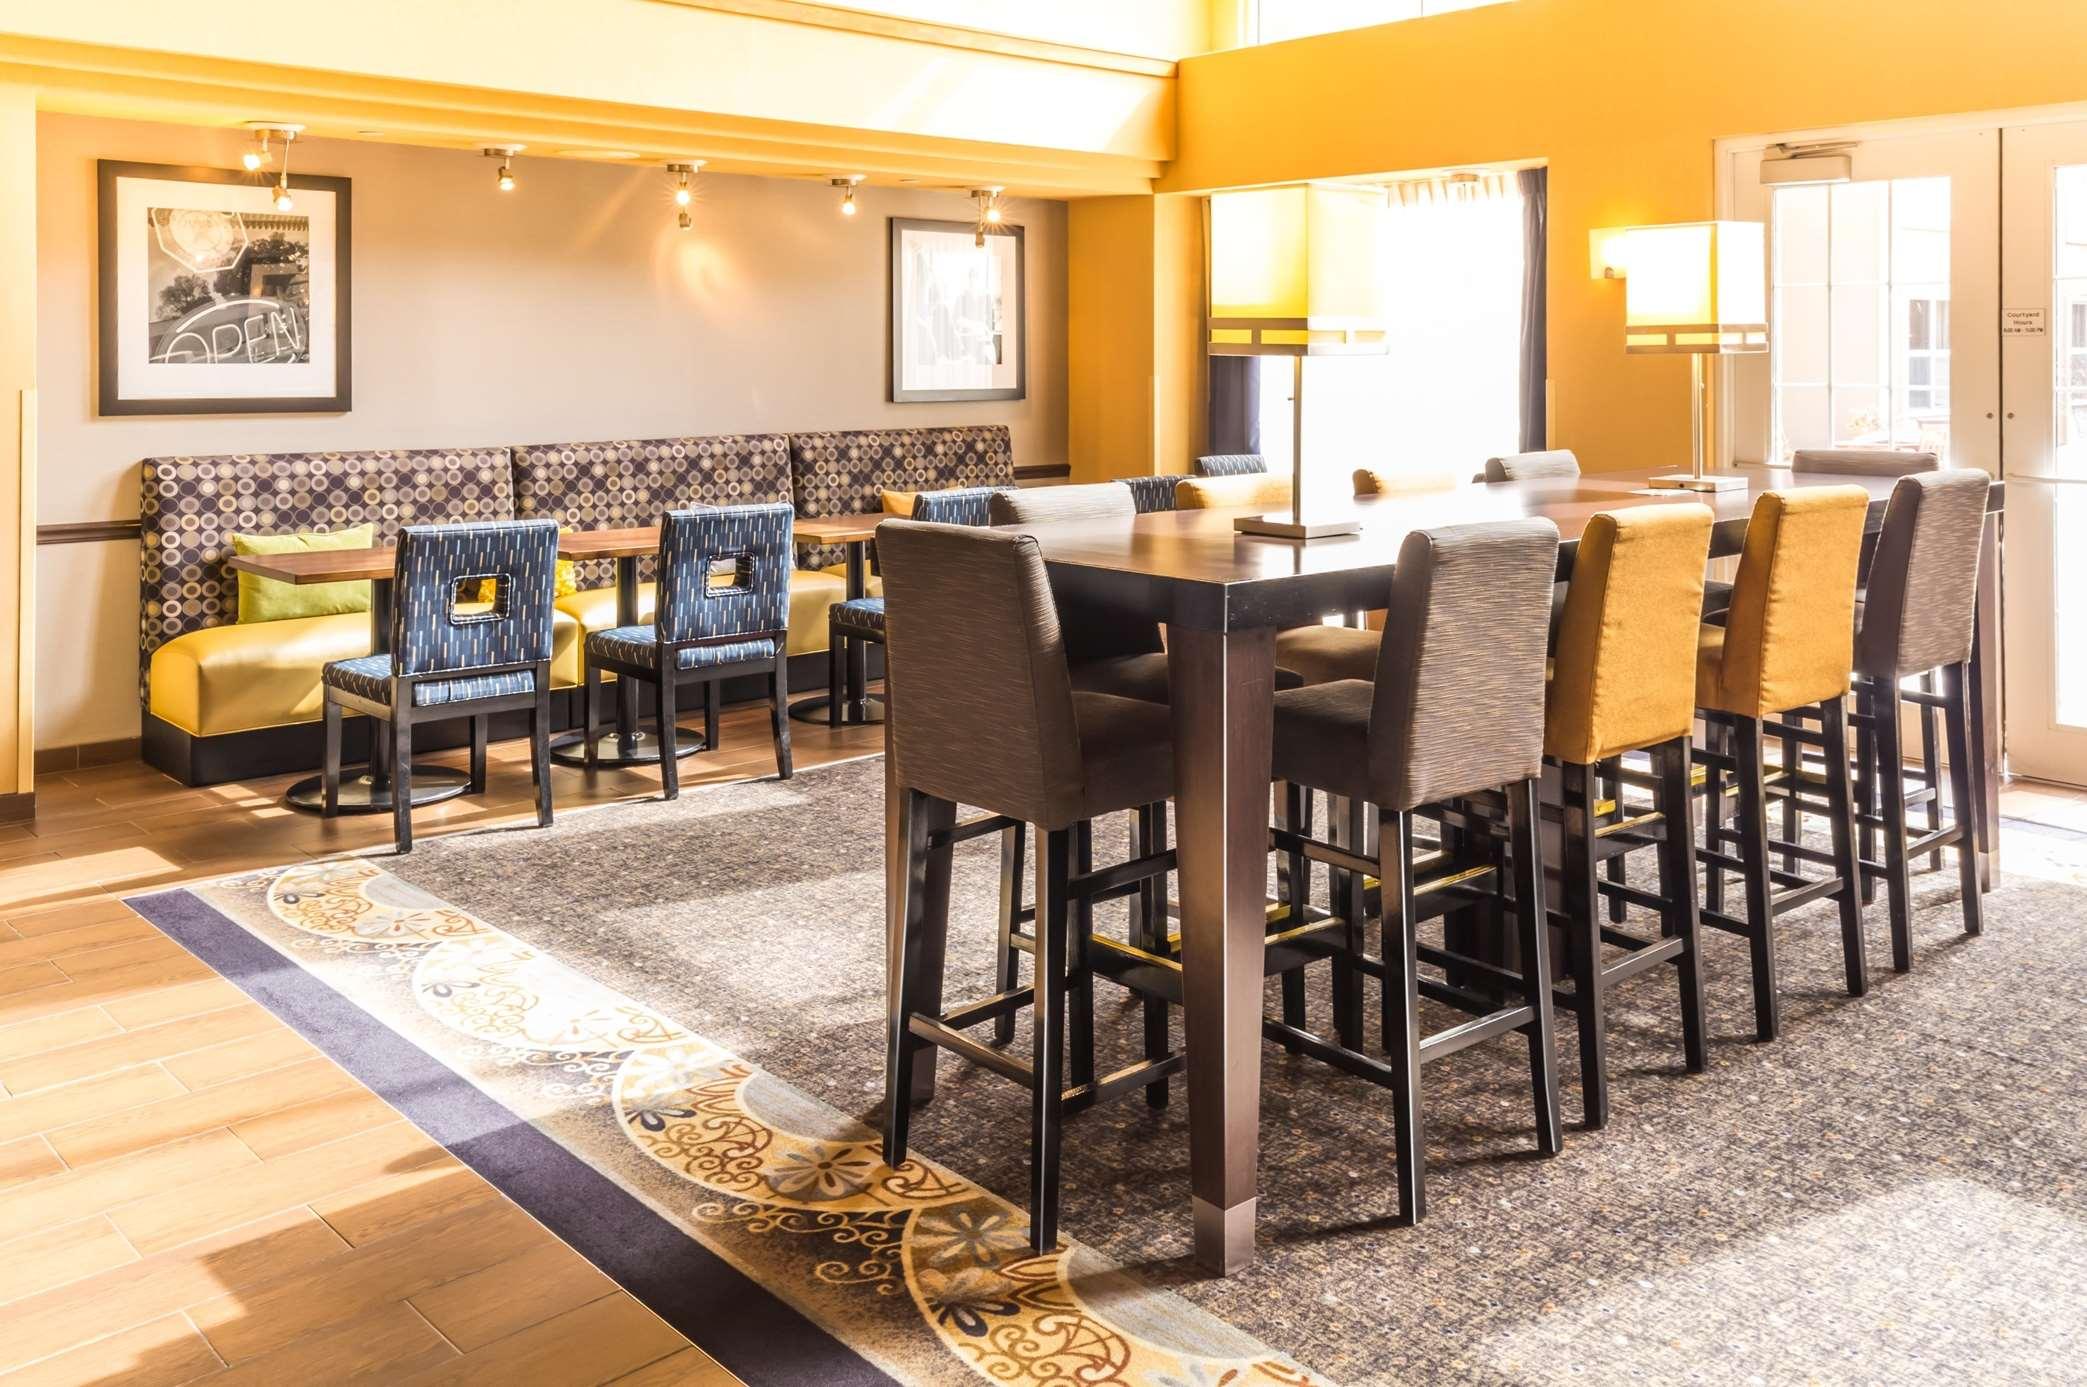 Hampton Inn & Suites Chicago/Hoffman Estates image 24